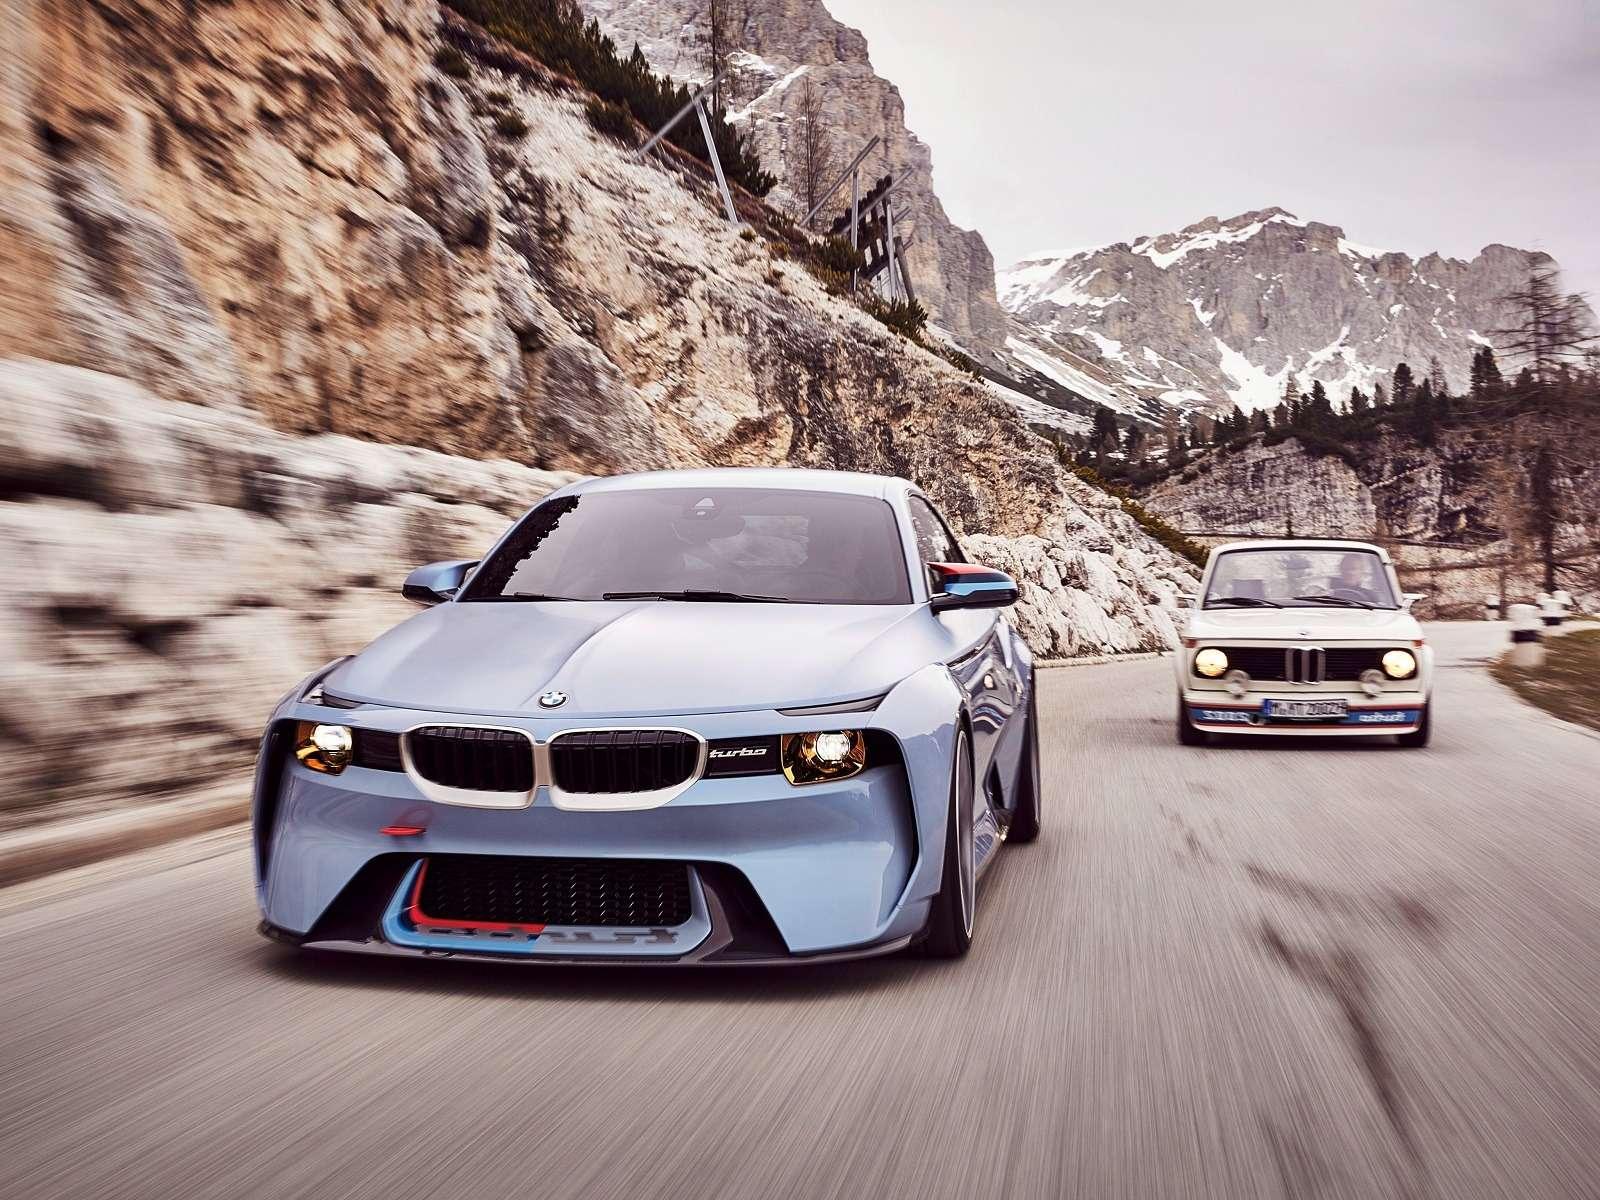 Иллюзия легенды: BMW поупражнялась натему 2002 turbo— фото 590508